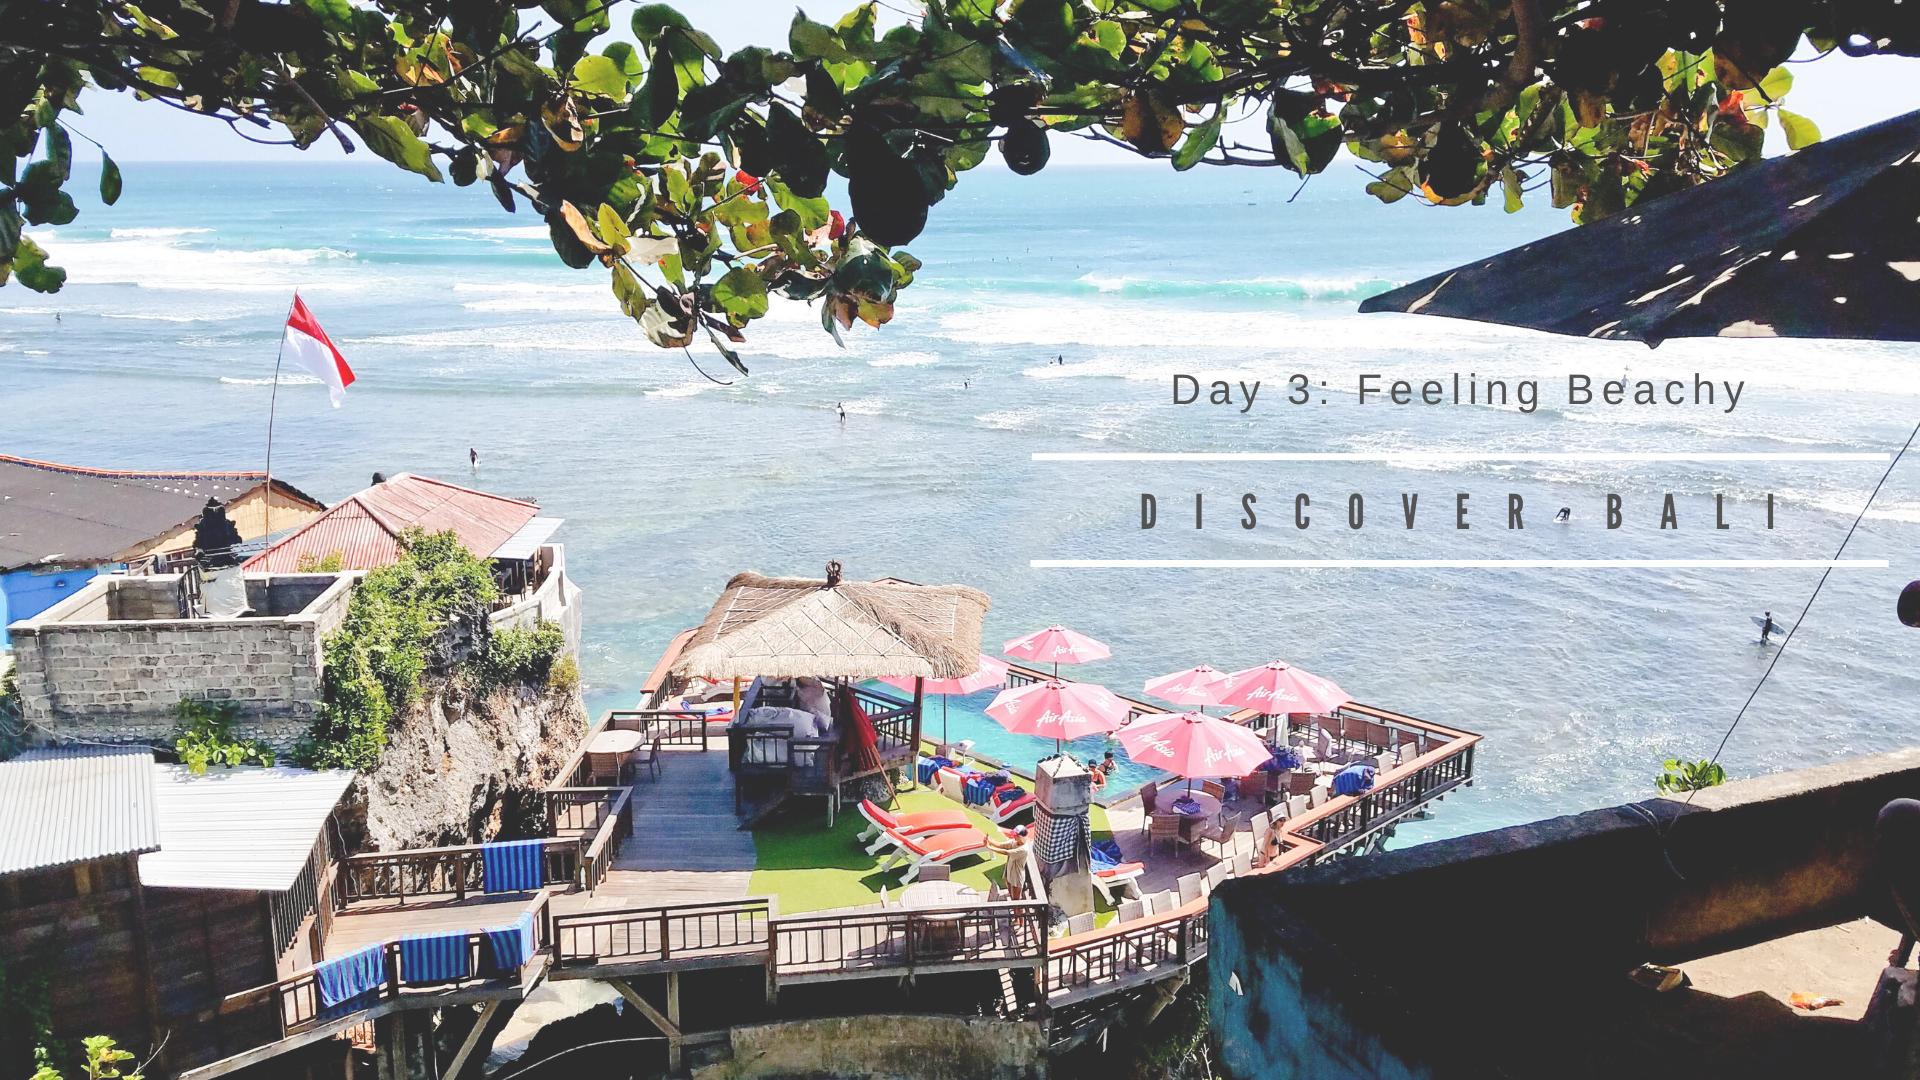 Discover Bali: Day 3 – Feeling Beachy